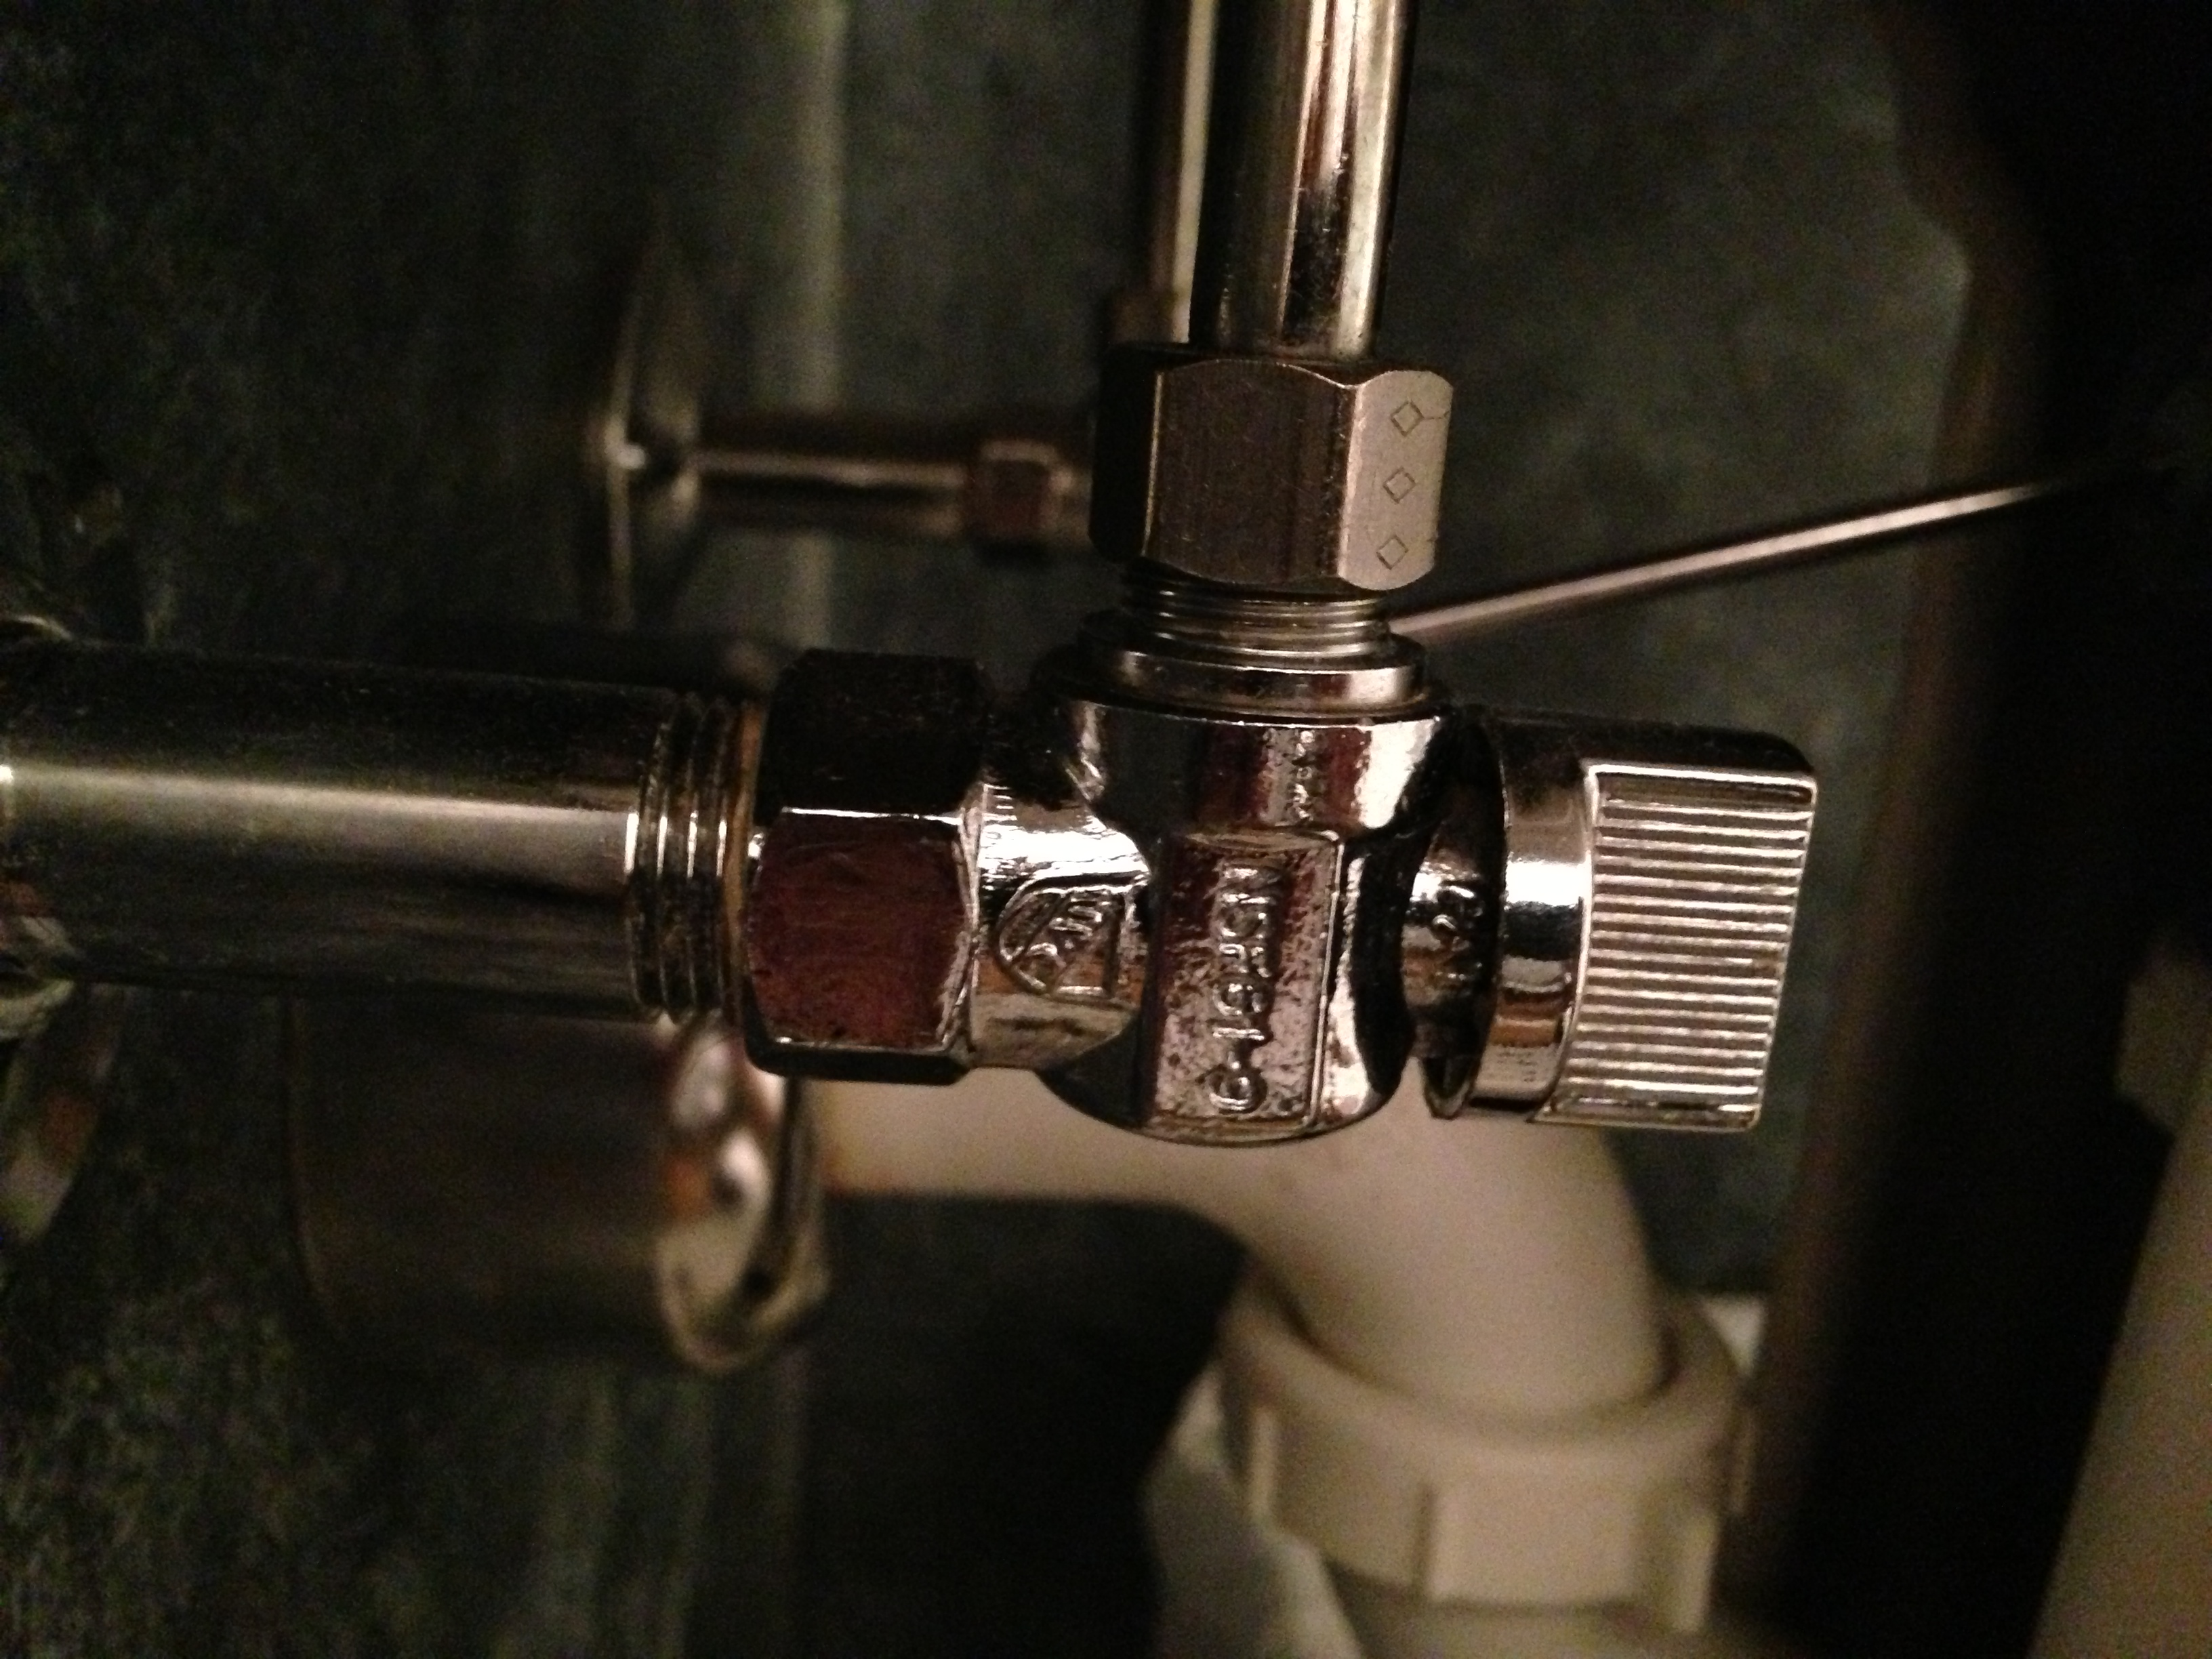 Replacement of toilet shut-off valve-img_4833.jpg